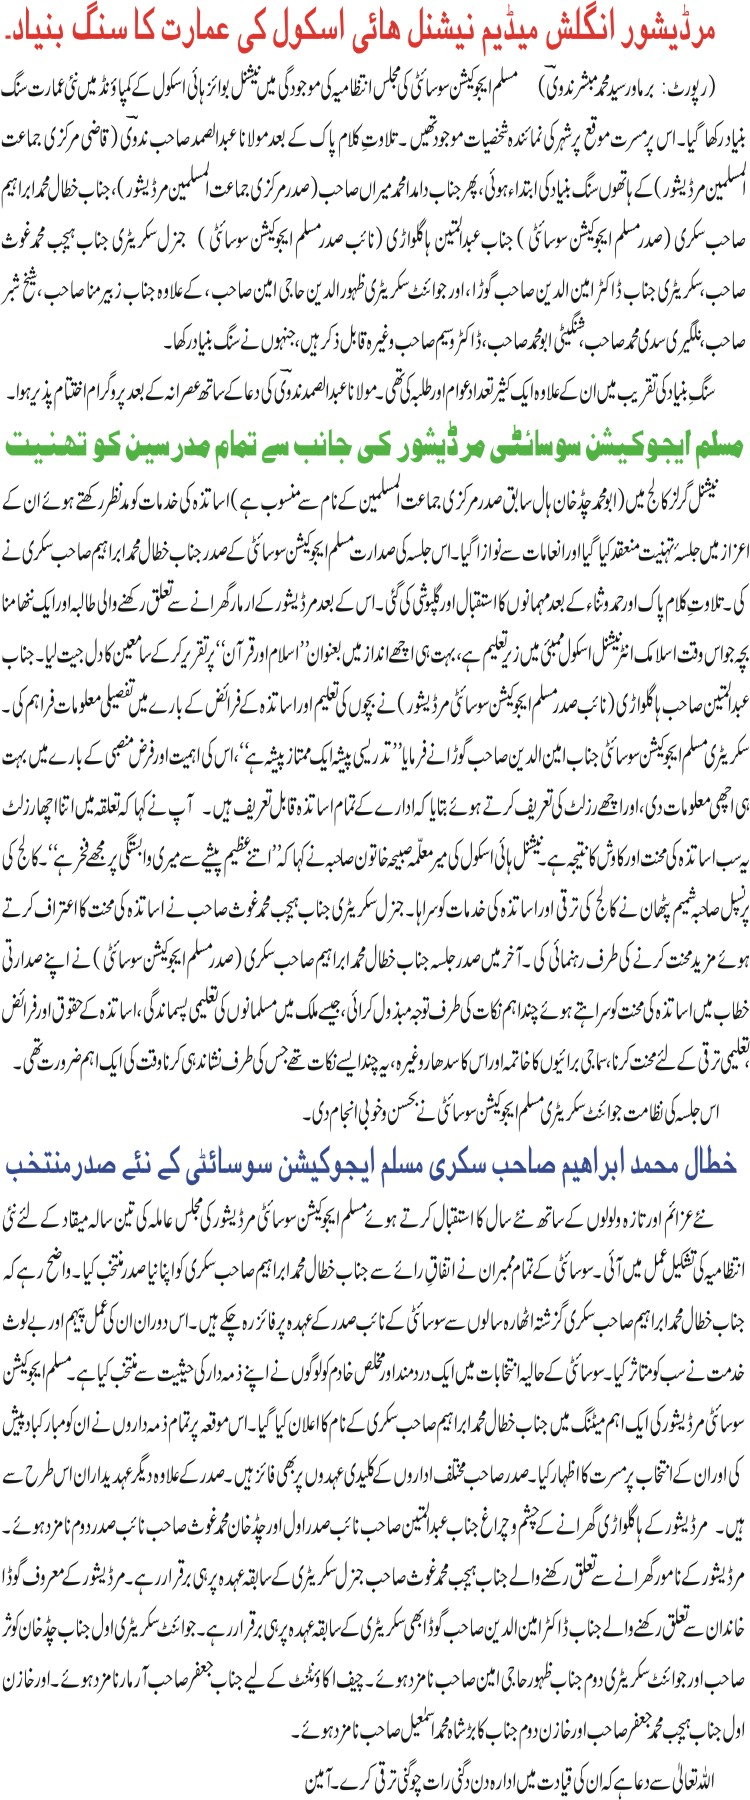 muslim education